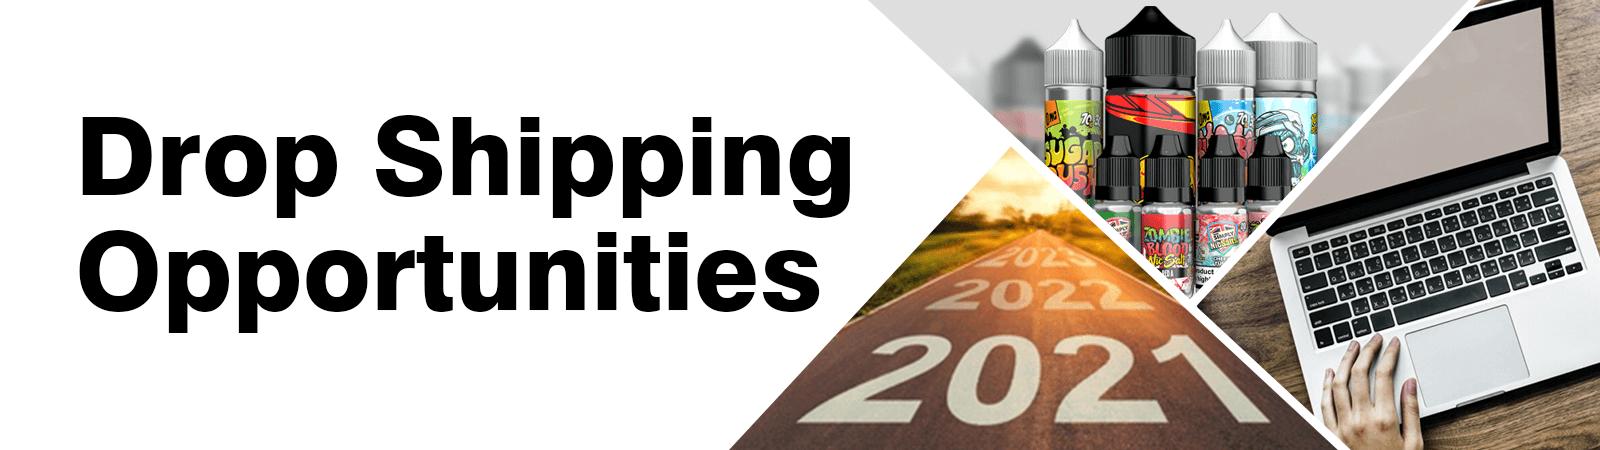 E-liquid Dropshipping Opportunities